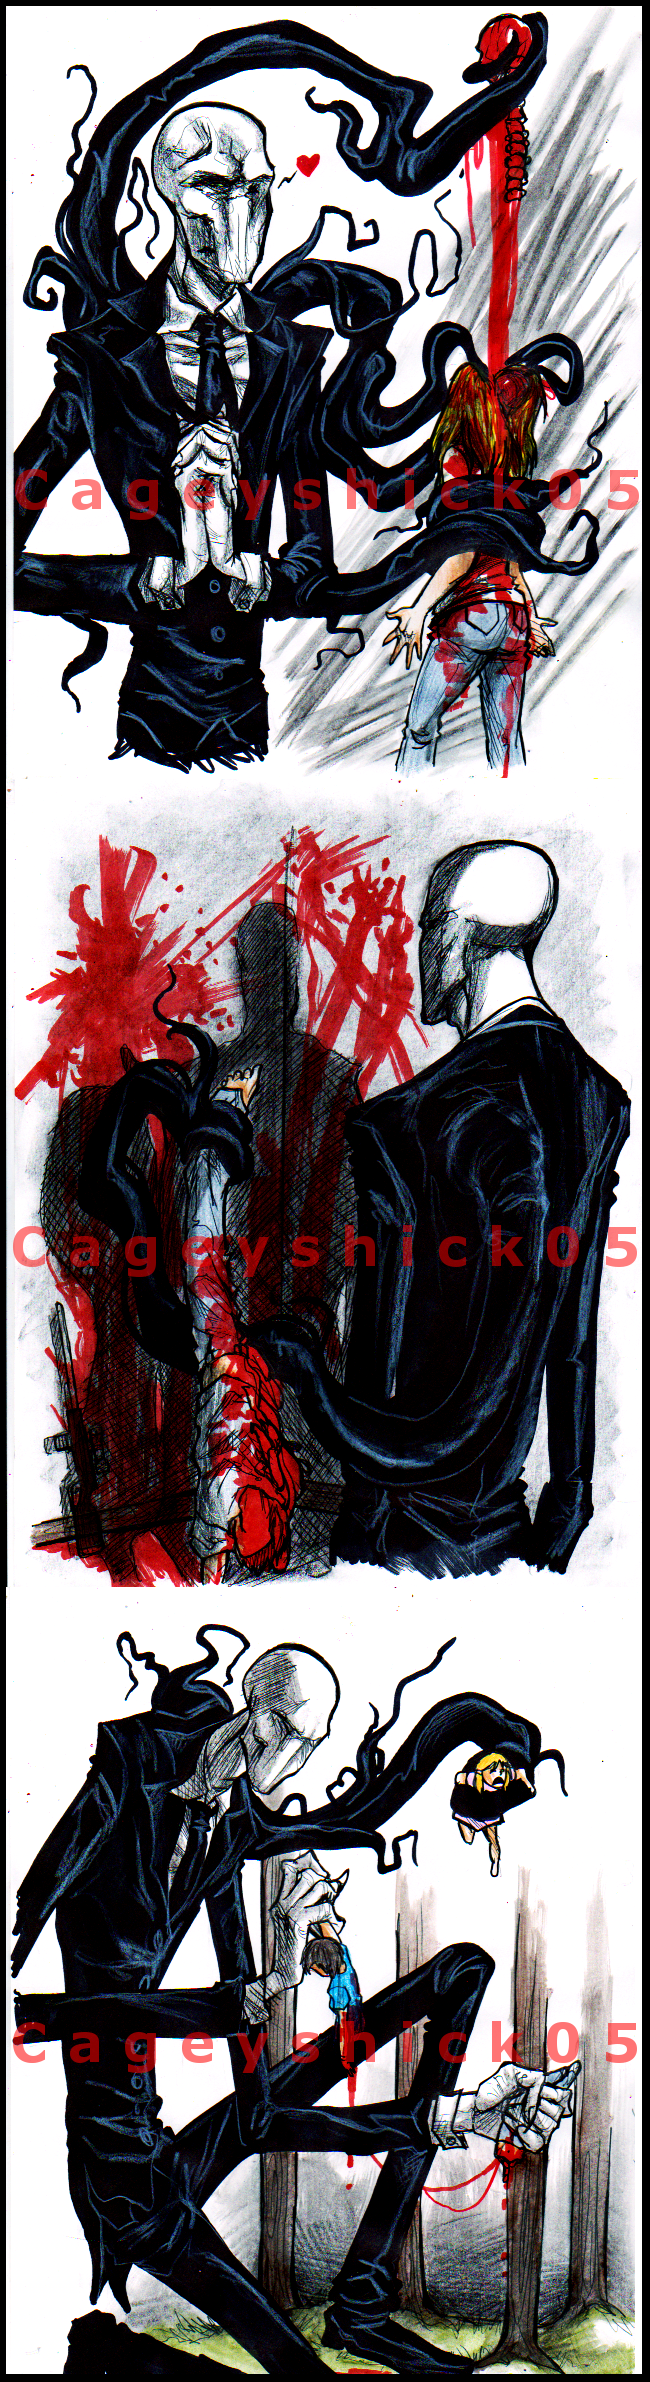 Slenderman doodles -10- by Cageyshick05